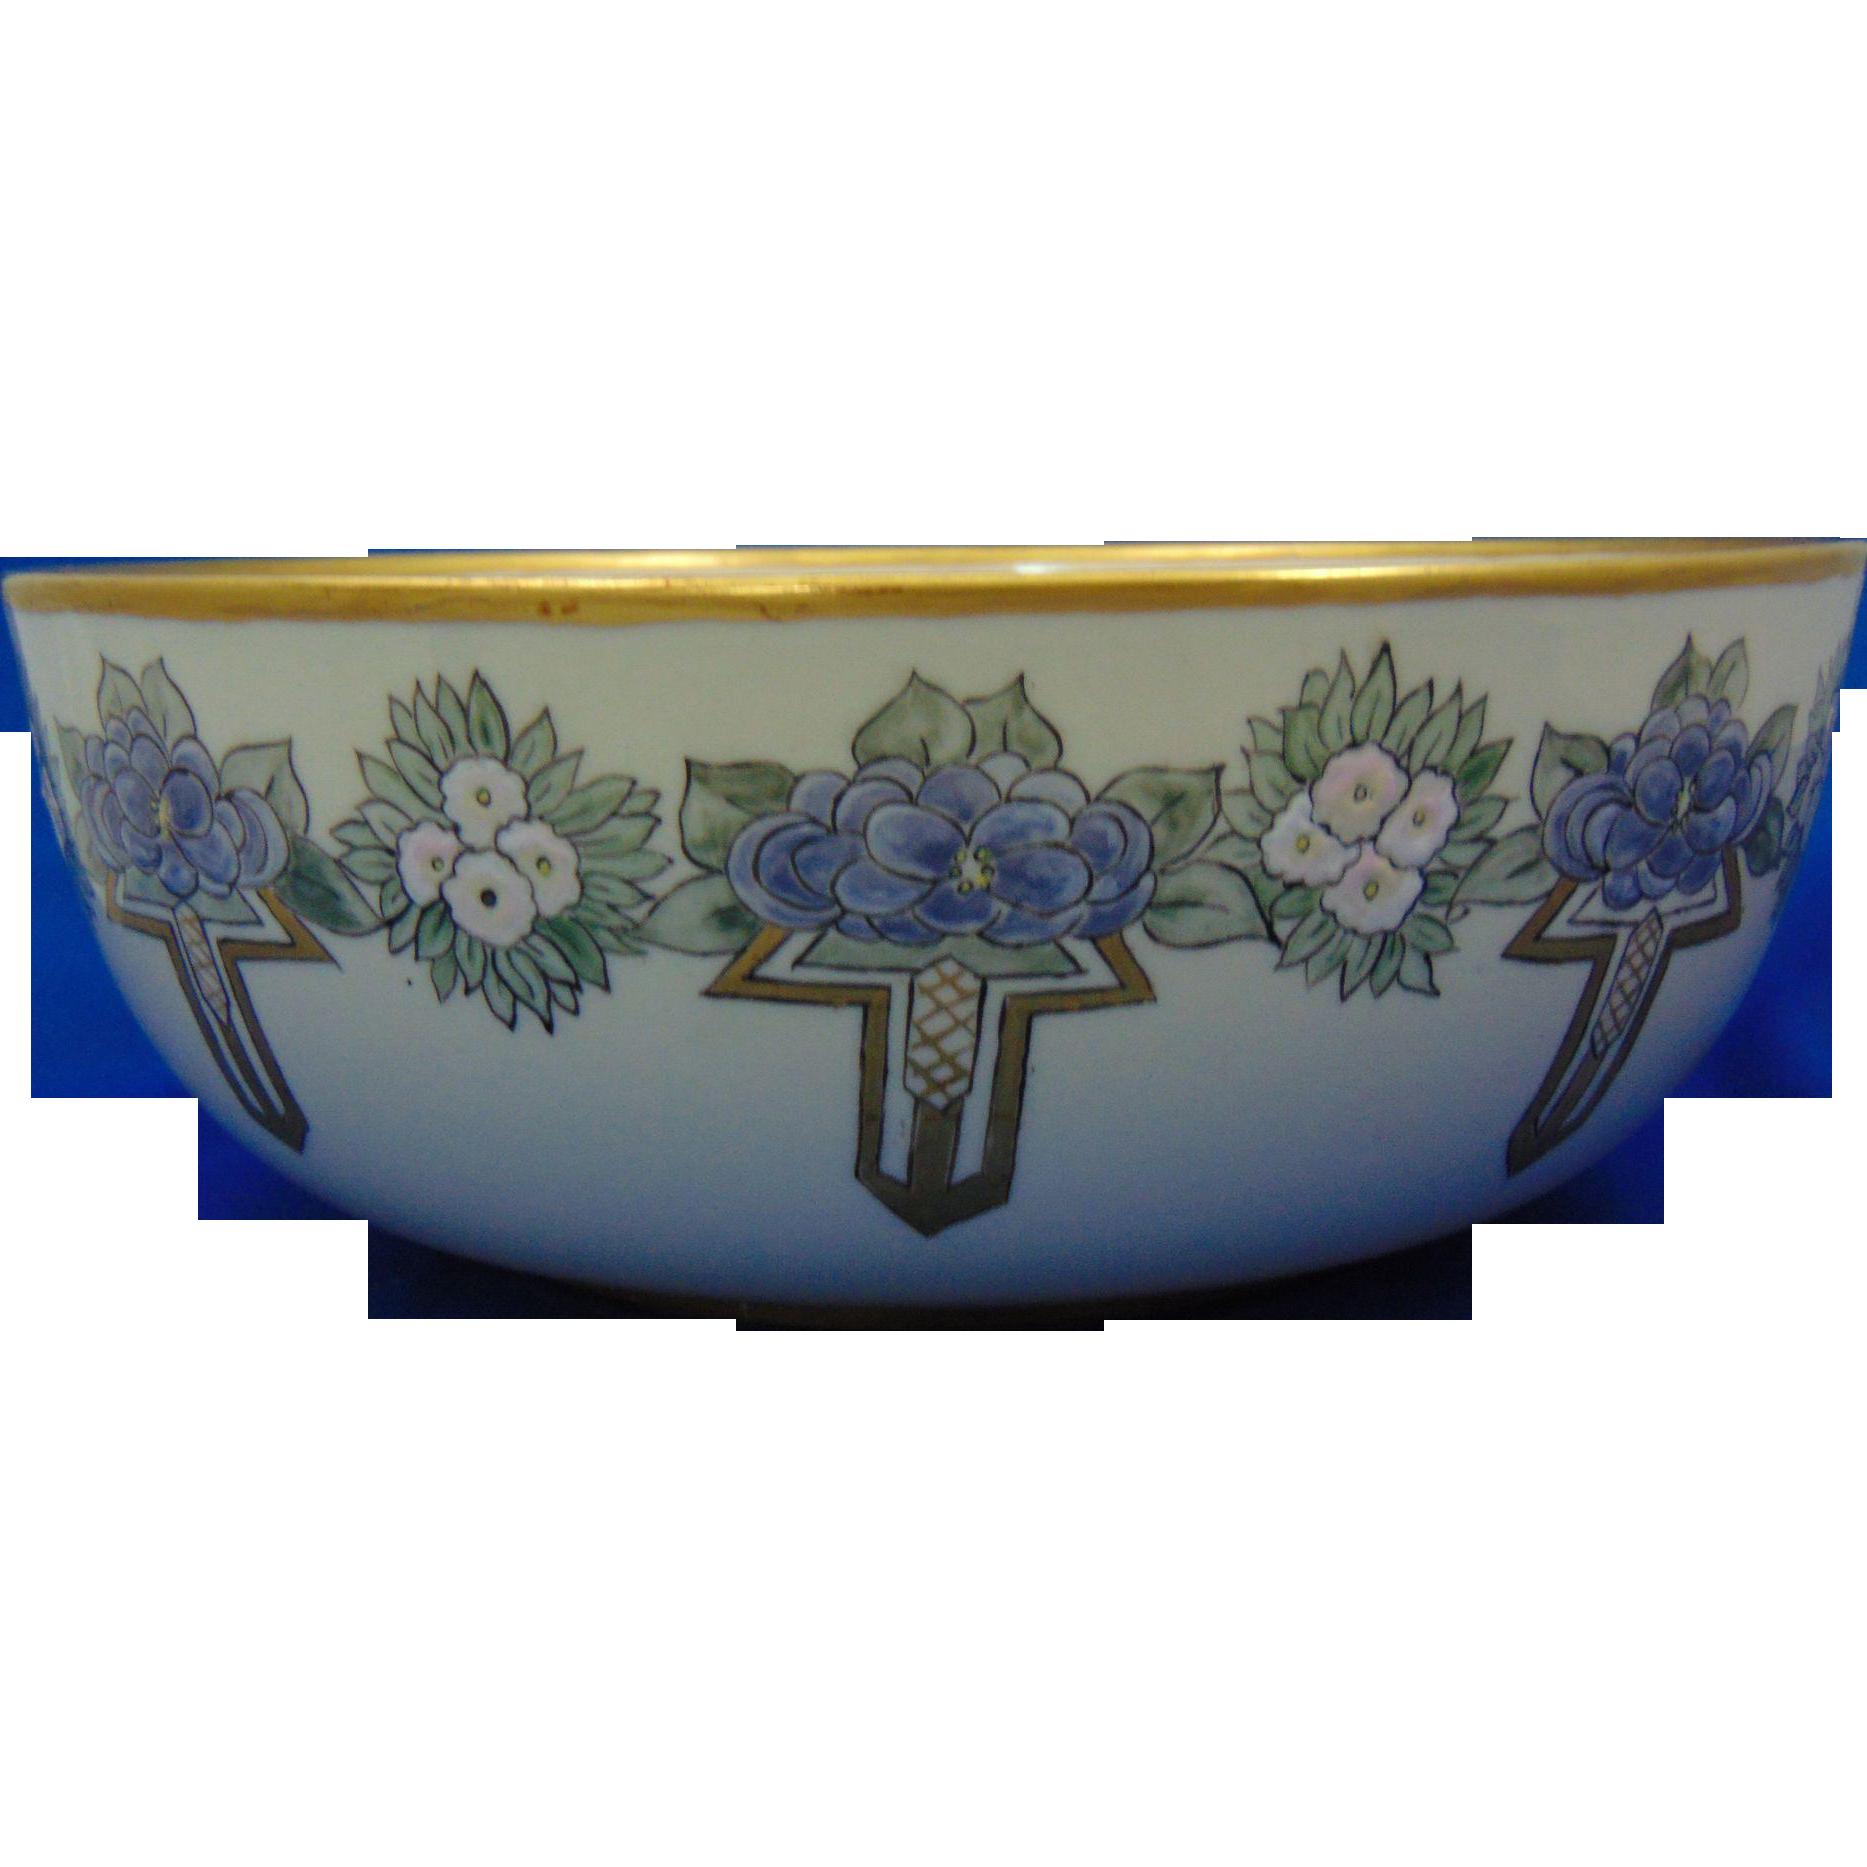 Willets Belleek Enameled Floral Design Centerpiece Bowl (c.1880-1904) - Keramic Studio Design